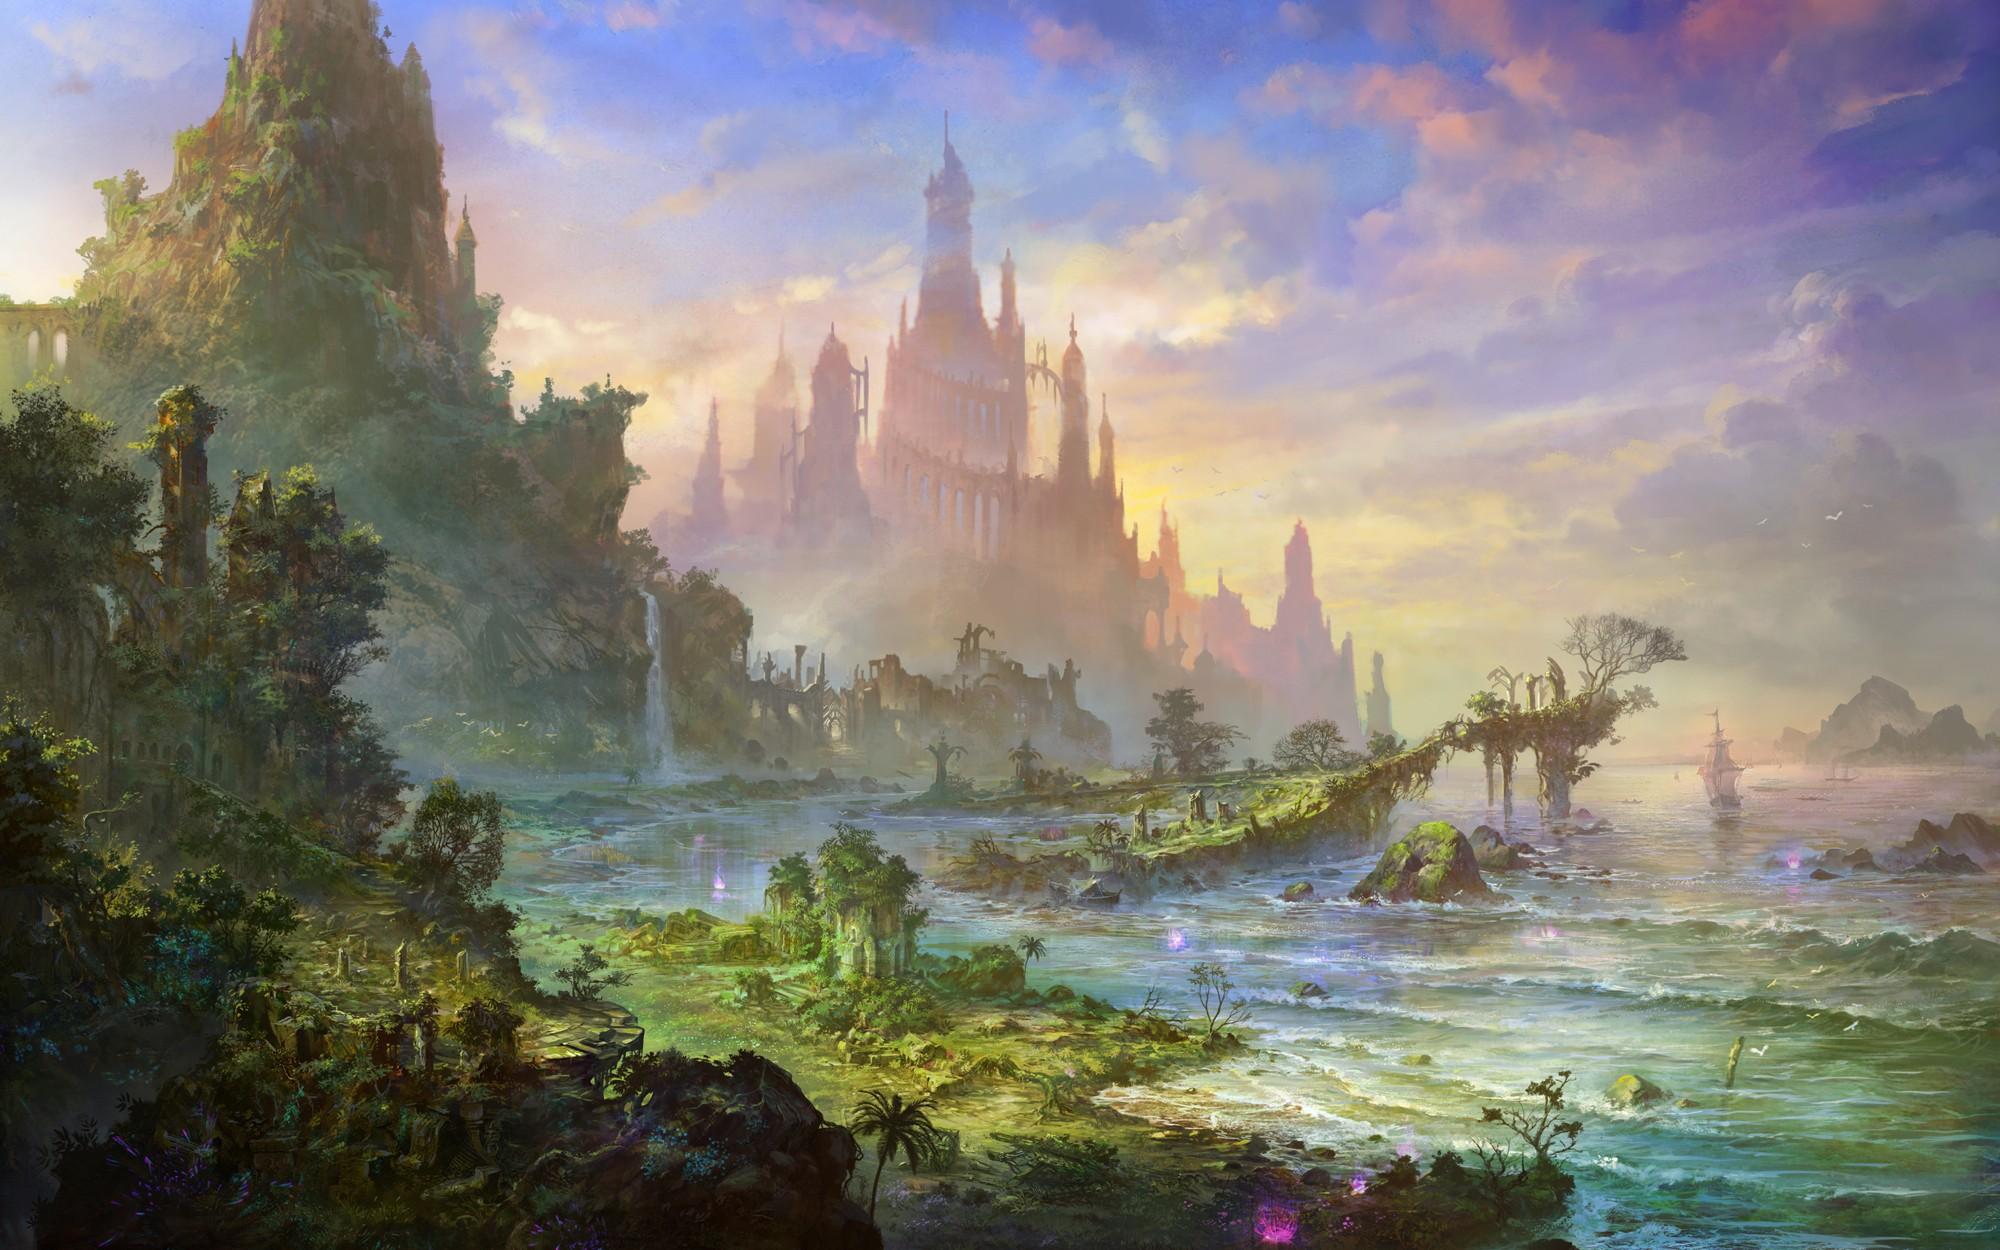 Dark anime background scenery download free stunning - Fantasy scenery wallpaper ...